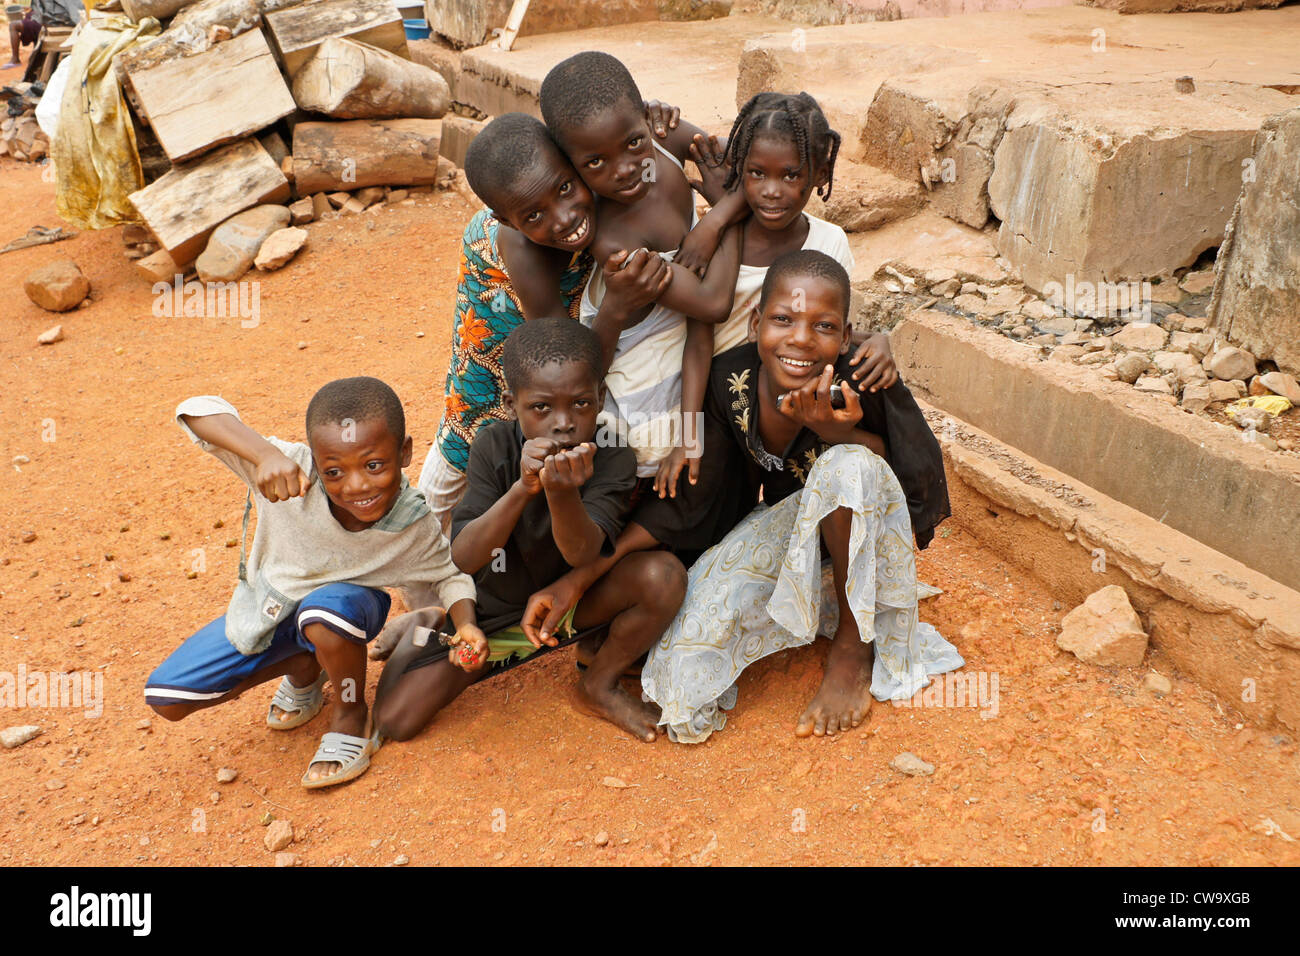 bb9bb9c42d749 Poor Children Posing Stock Photos   Poor Children Posing Stock ...